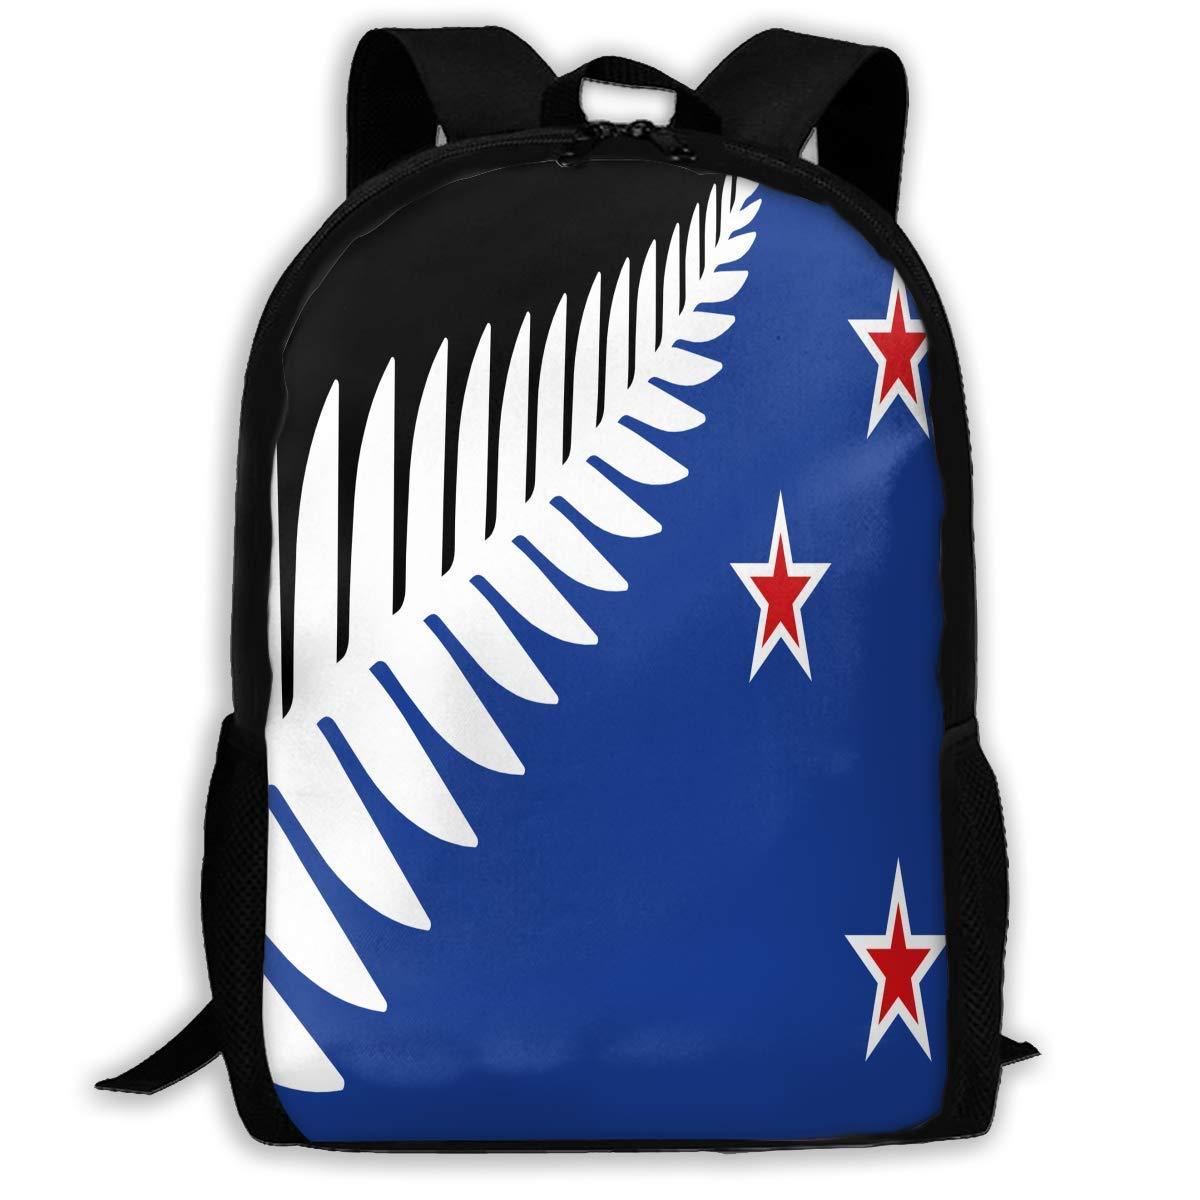 dewdferf Casual Backpack New Zealand Flag 3D Printing School Bags for Boys Girls Unisex Adult Shoulder Bag Daily Bag